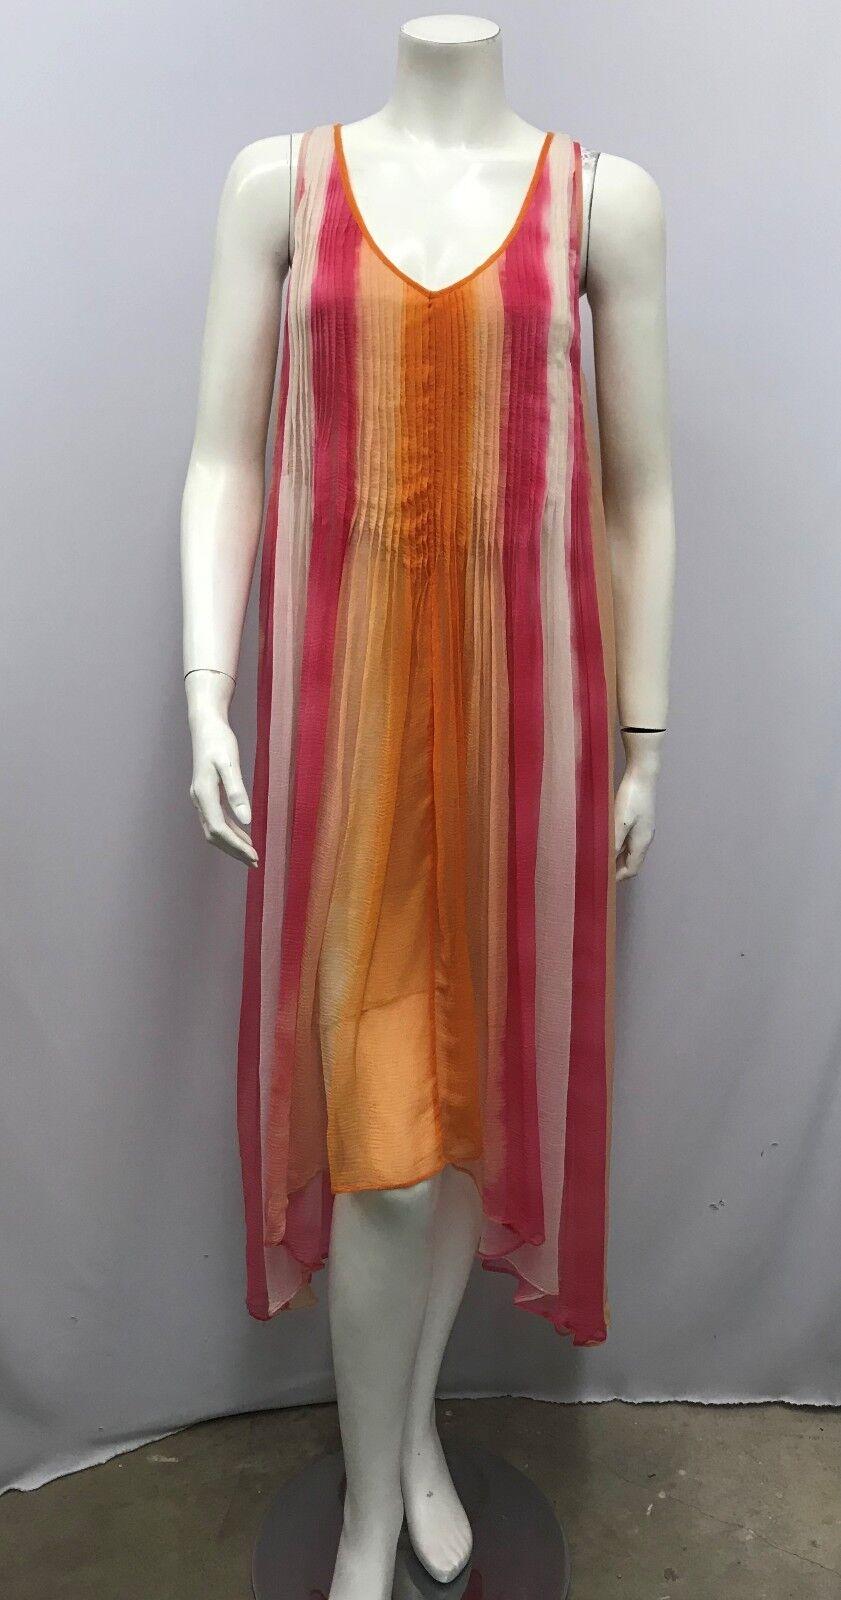 CALYPSO ST. BARTH DRESS Orange OFF Weiß Rosa WATERFarbe DESIGN FLOWEY PLEATS S